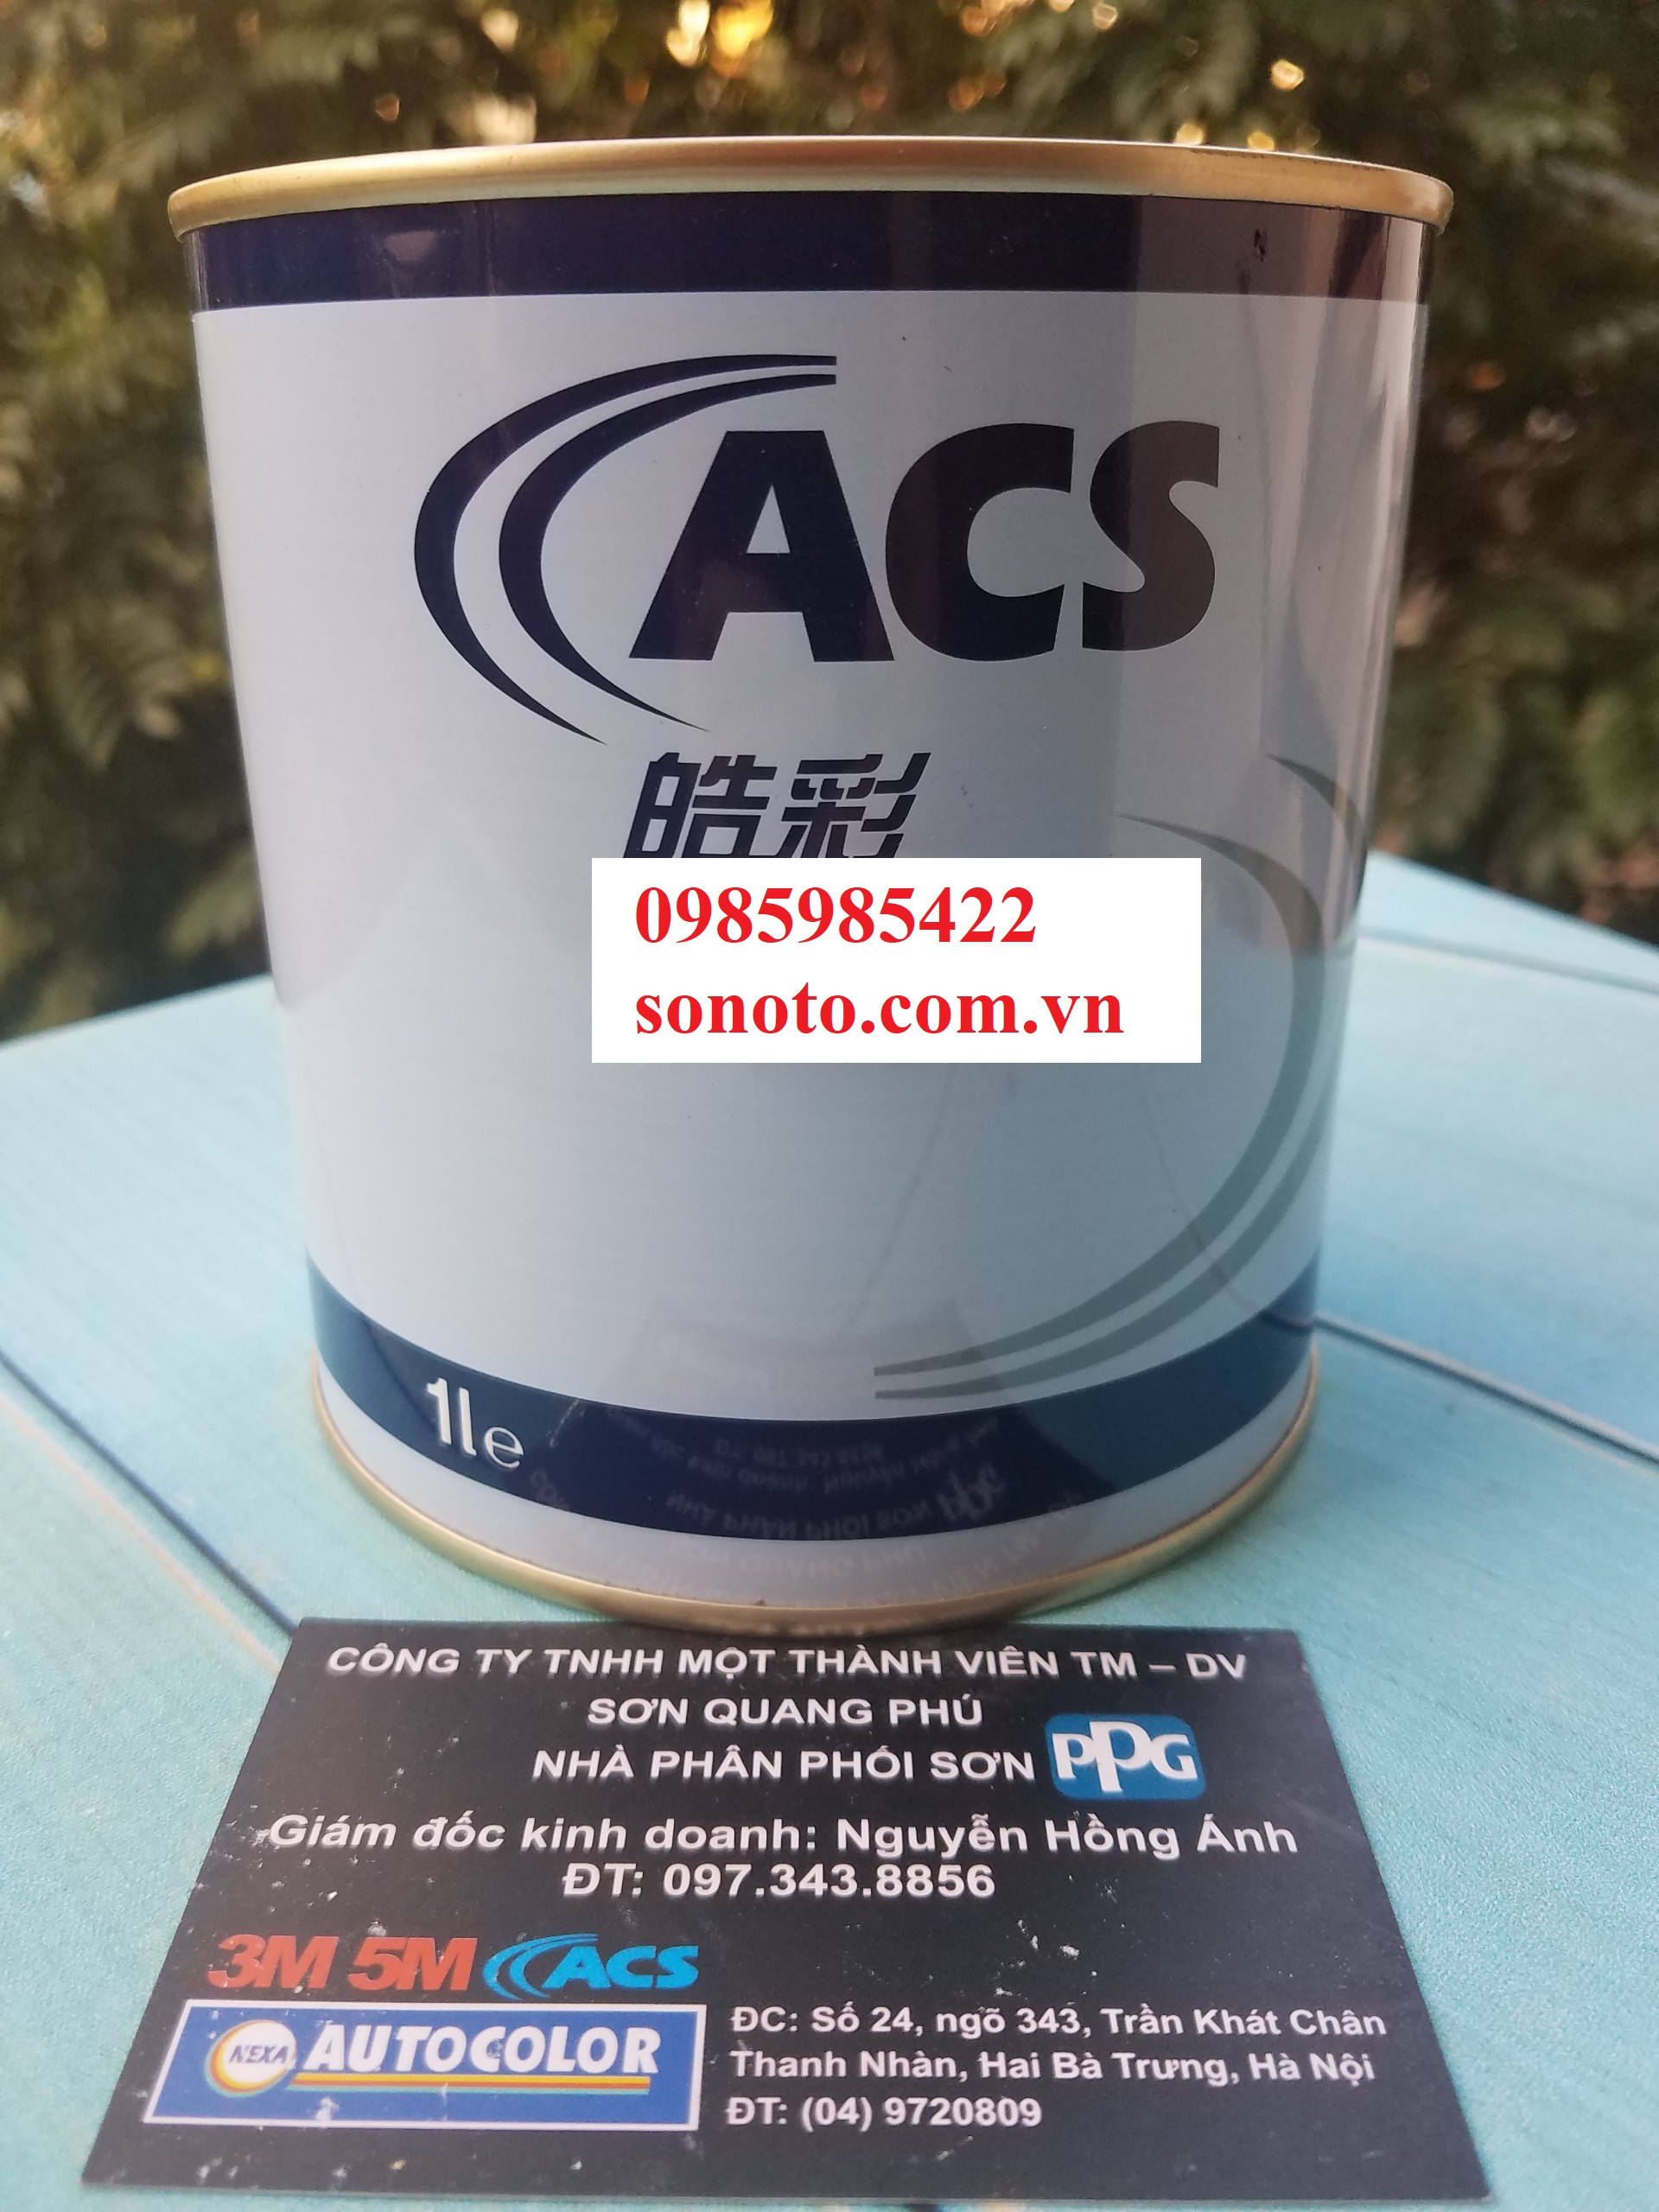 p549-r001-son-goc-2k-giam-cuong-do-mau-trang-1-lit-acs